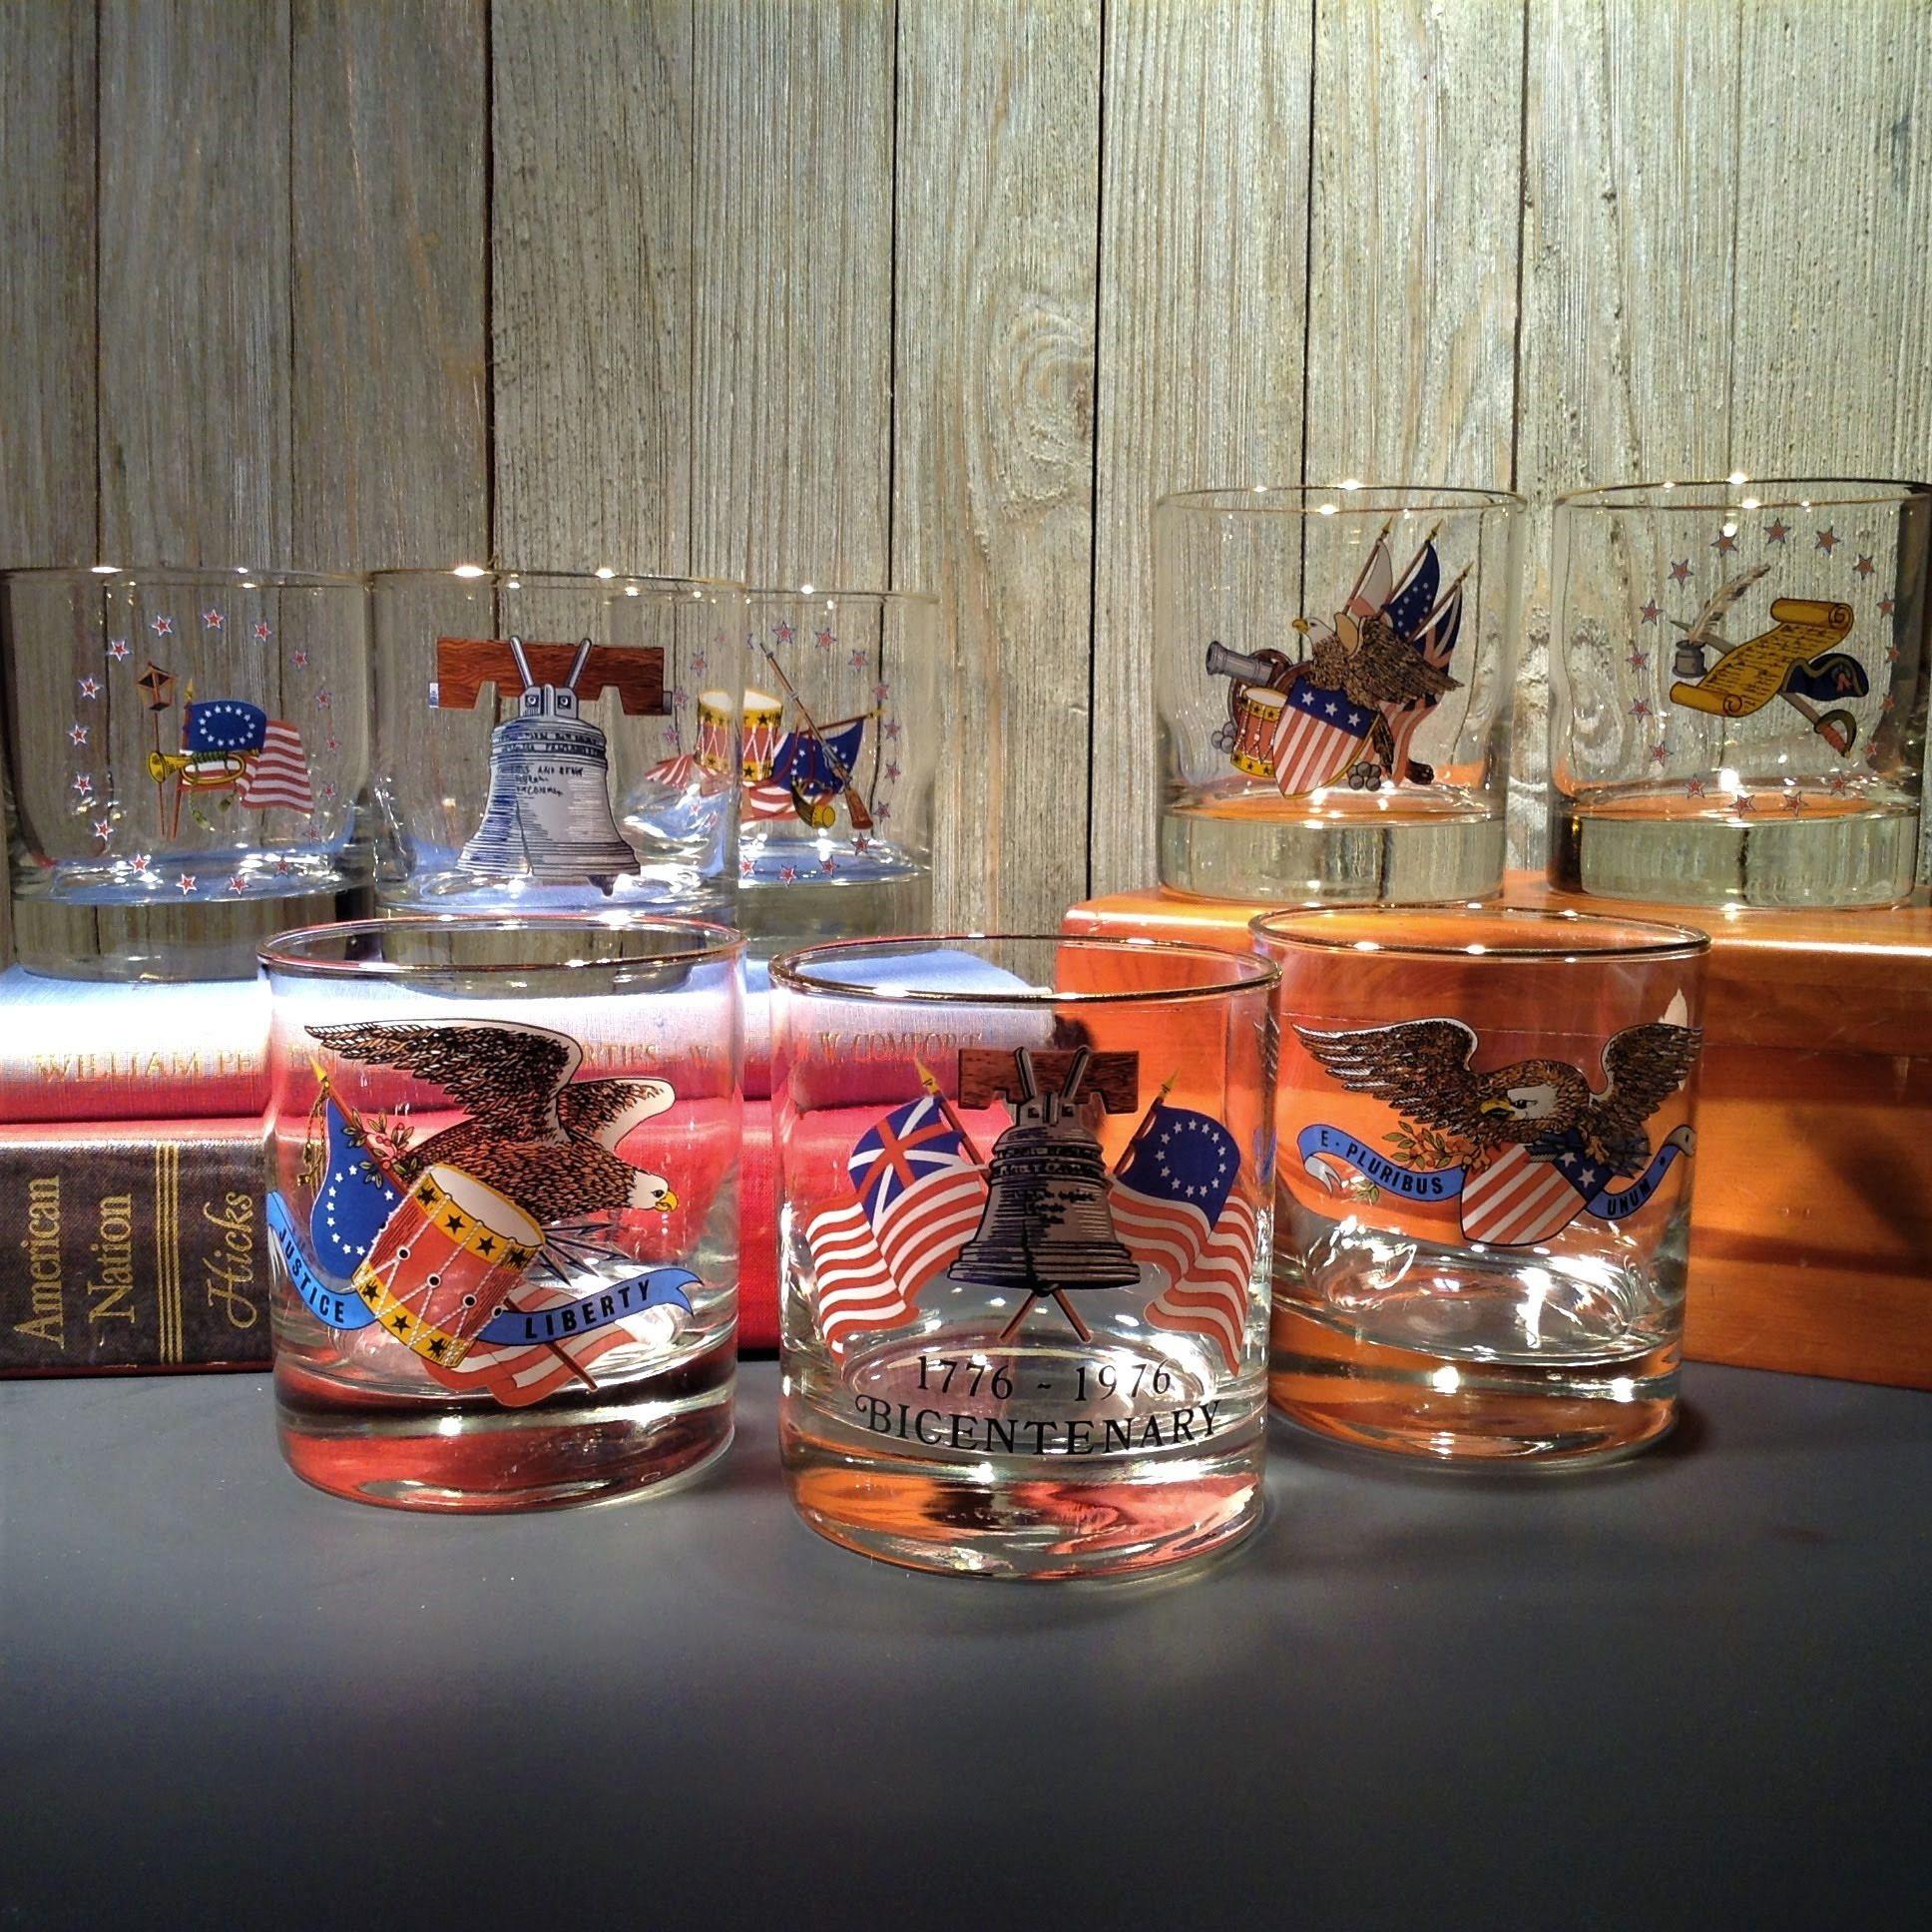 Vintage Rocks Glasses, 8 West Virginia Glass Handmade Old Fashion Cocktail  Glasses, Patriotic US